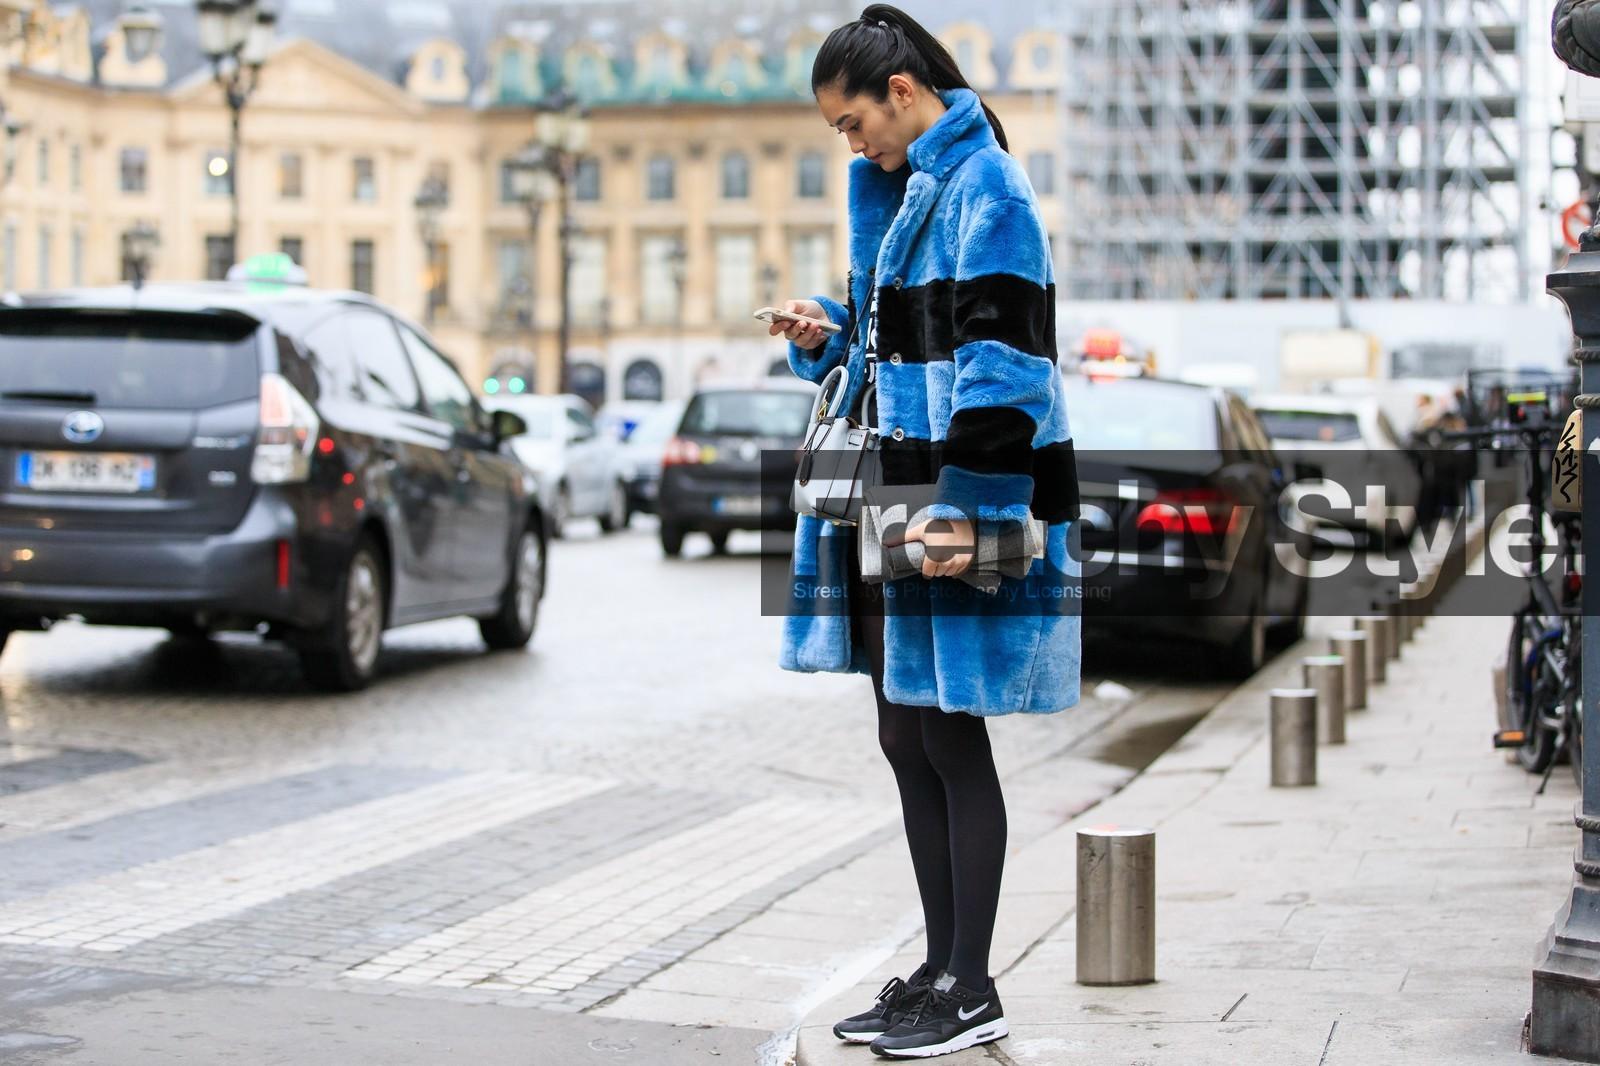 mini skirt and trainers